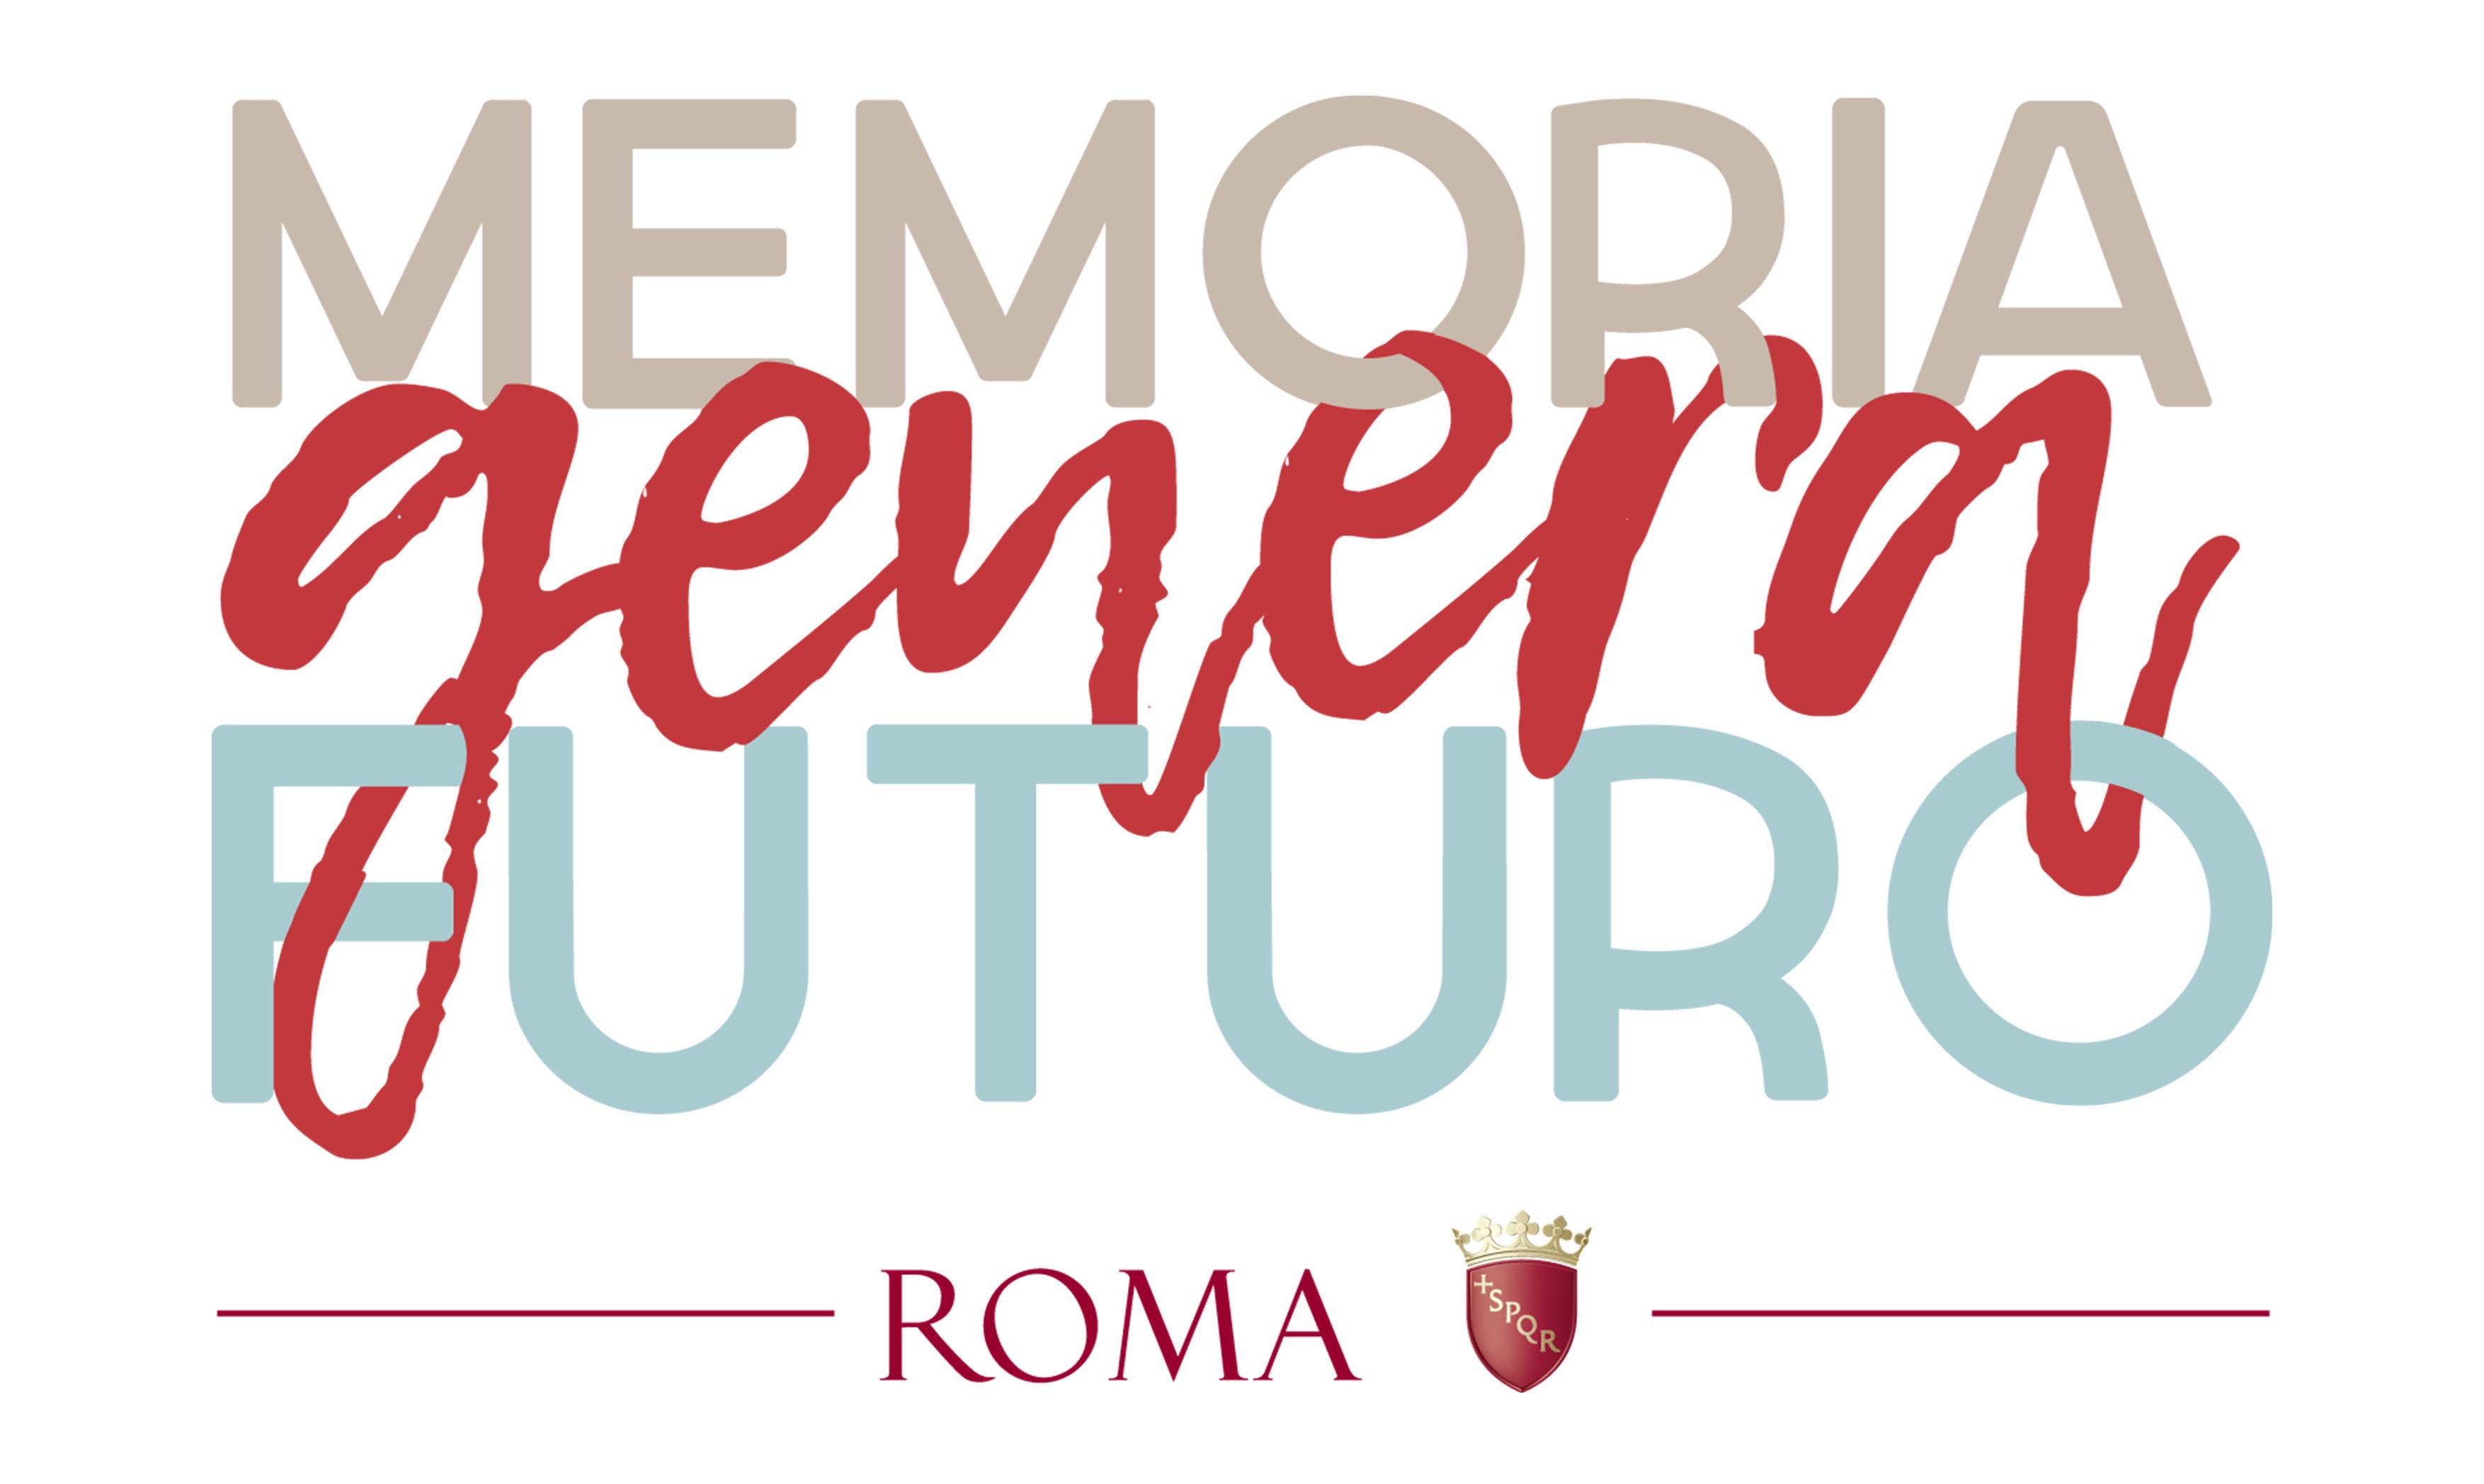 Logo Memoria genera futuro